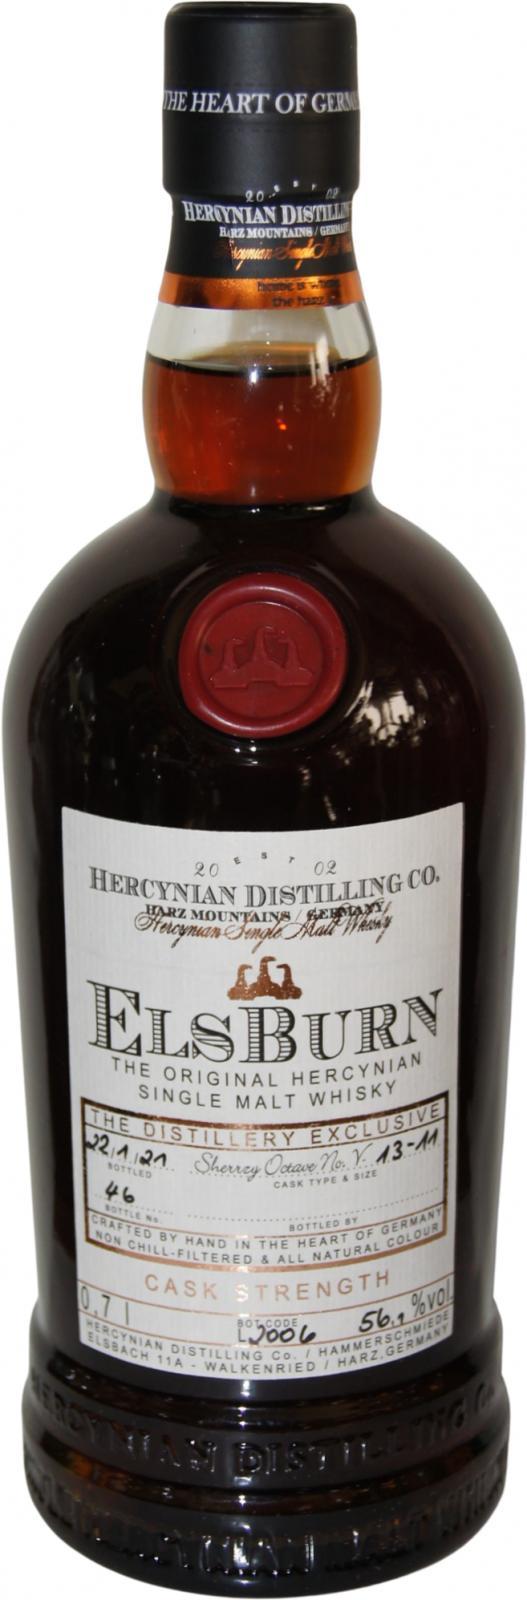 ElsBurn 2013